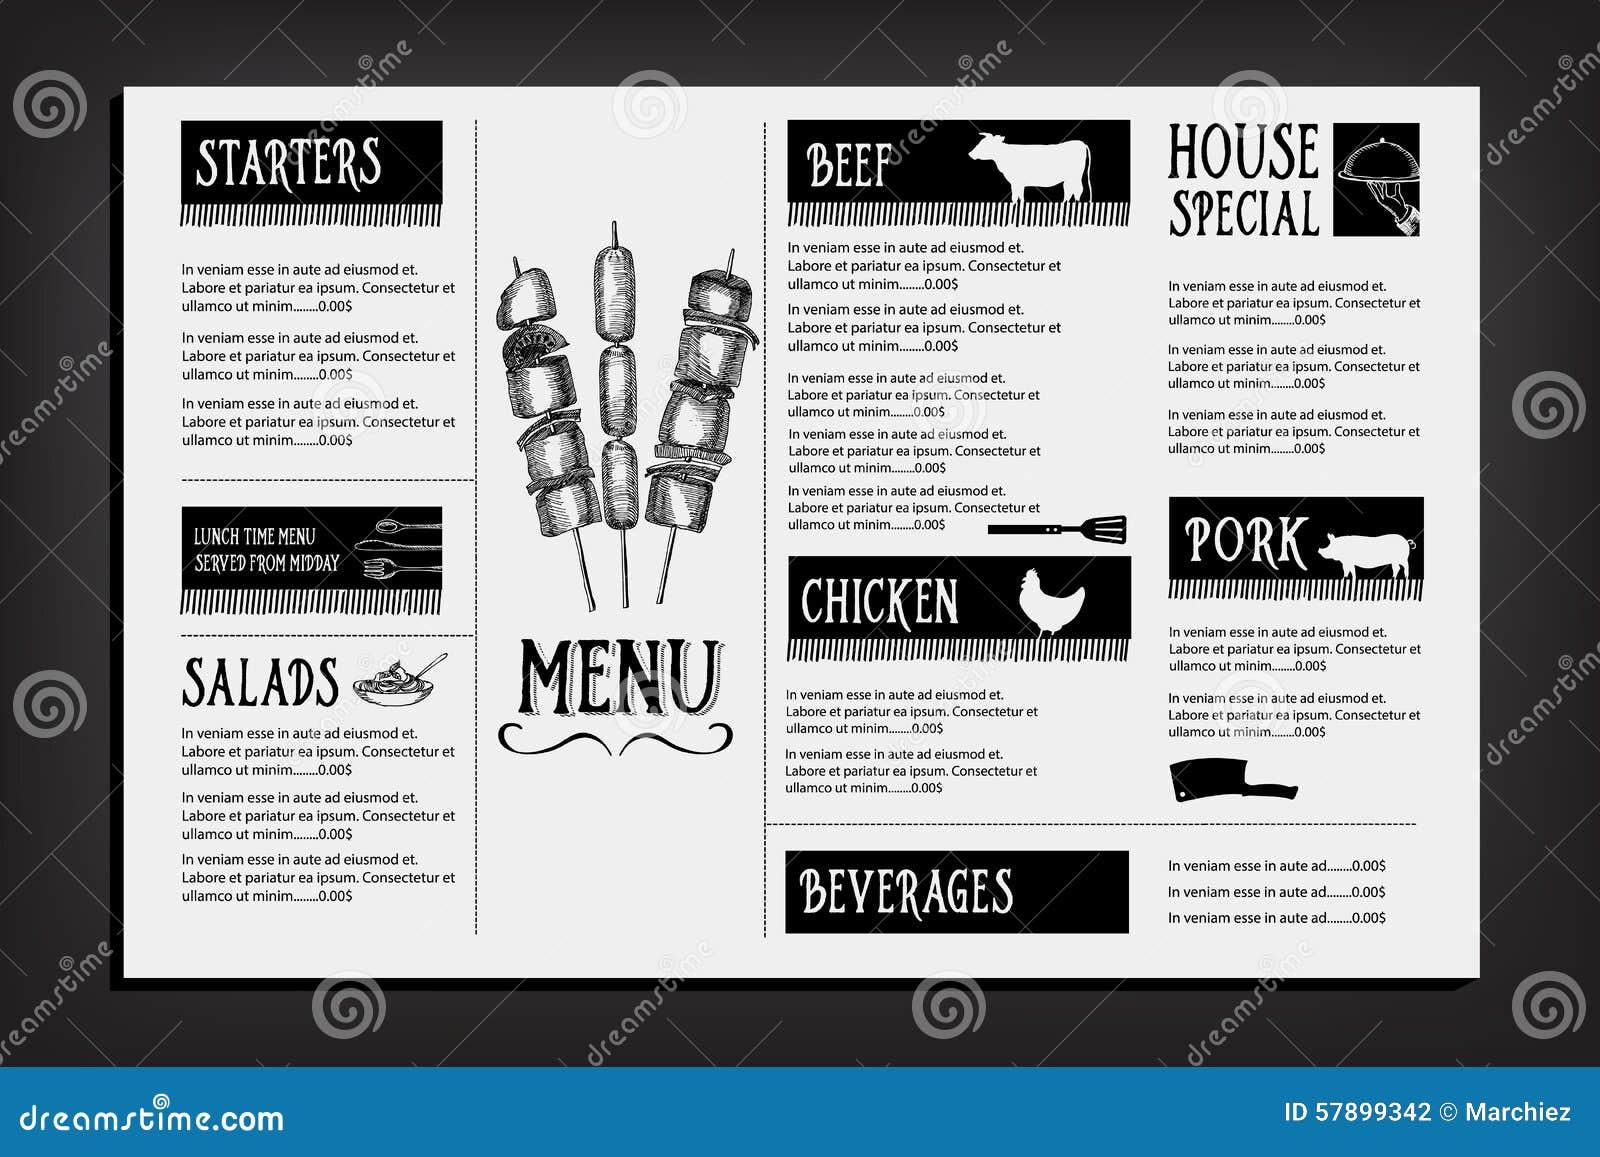 Cafe menu restaurant brochure food design template stock